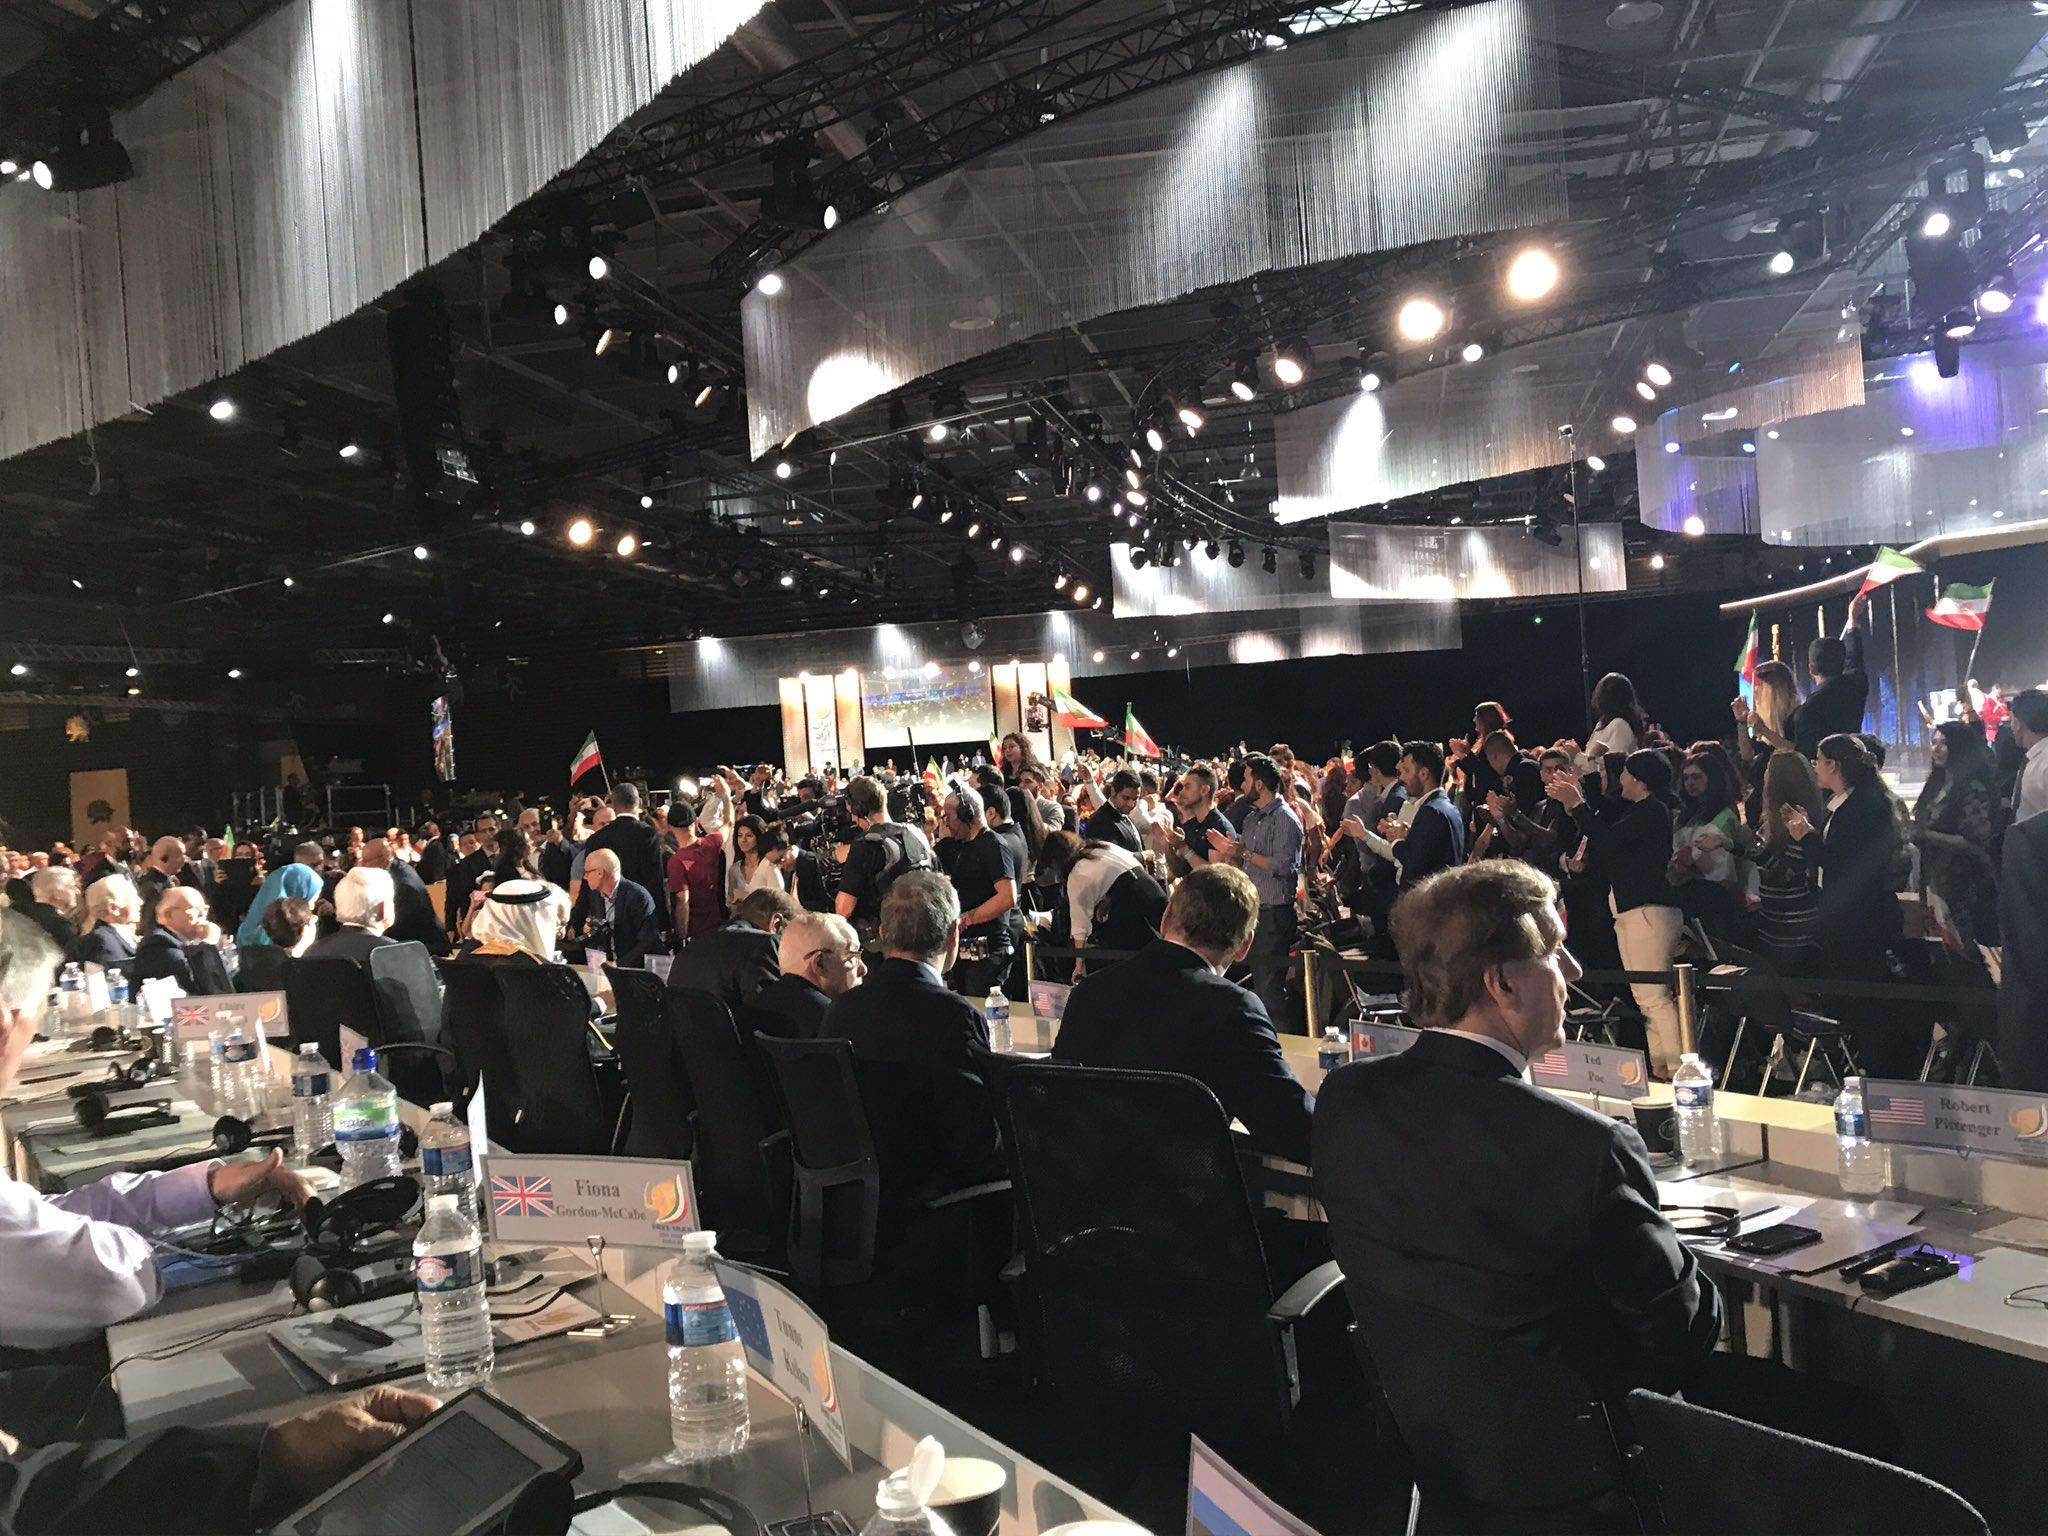 Strong bipartisan U.S. delegation at Paris #FreeIran Rally, Joe Lieberman, Newt Gingrich, Ed Rendell, Rudy Giuliani, Tom Ridge, Louis Freeh https://t.co/cFibhxGDca